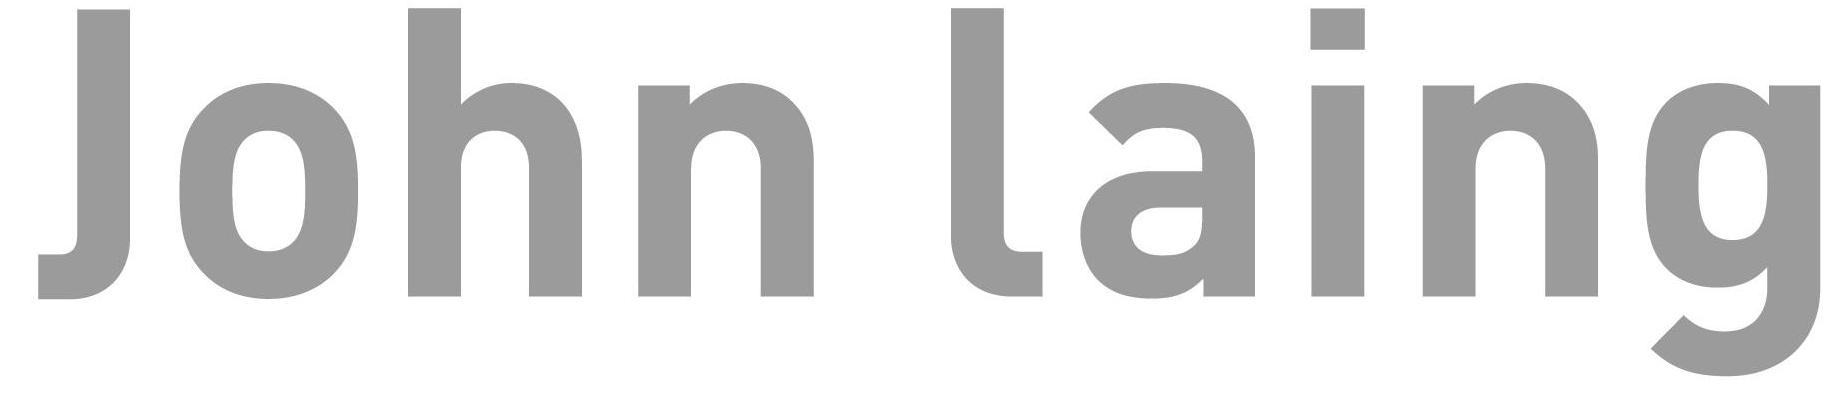 John_Laing-logo